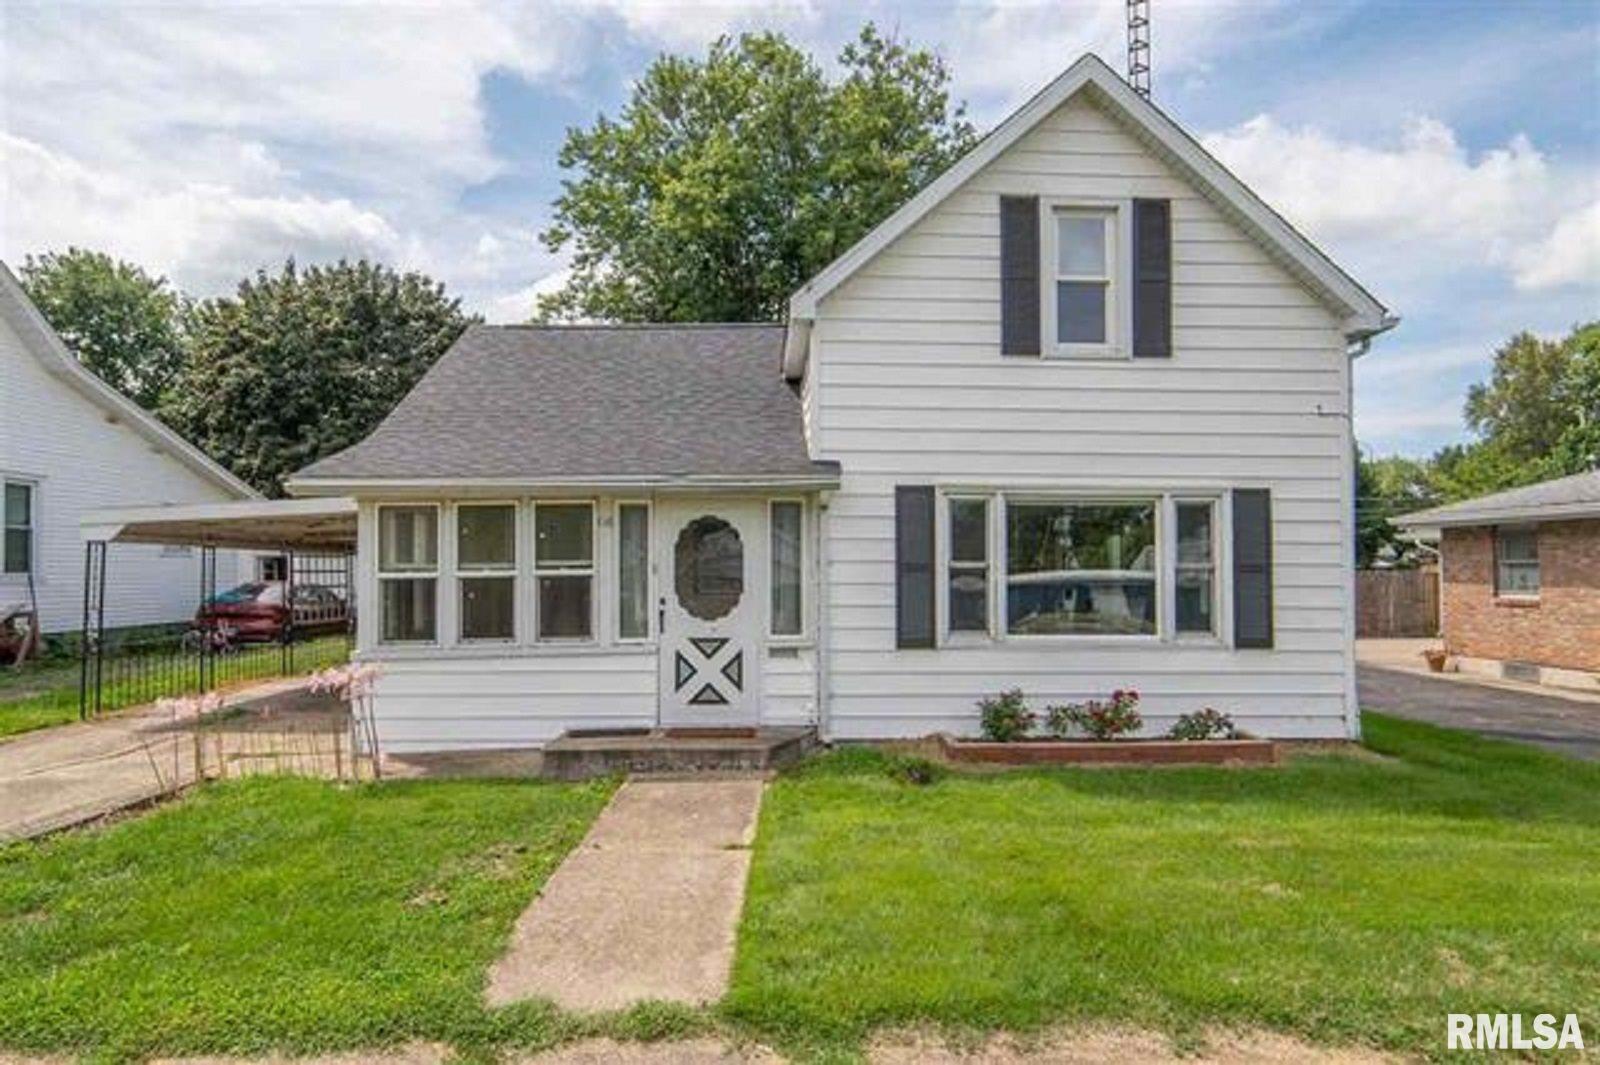 116 S LOGAN Property Photo - Mason City, IL real estate listing